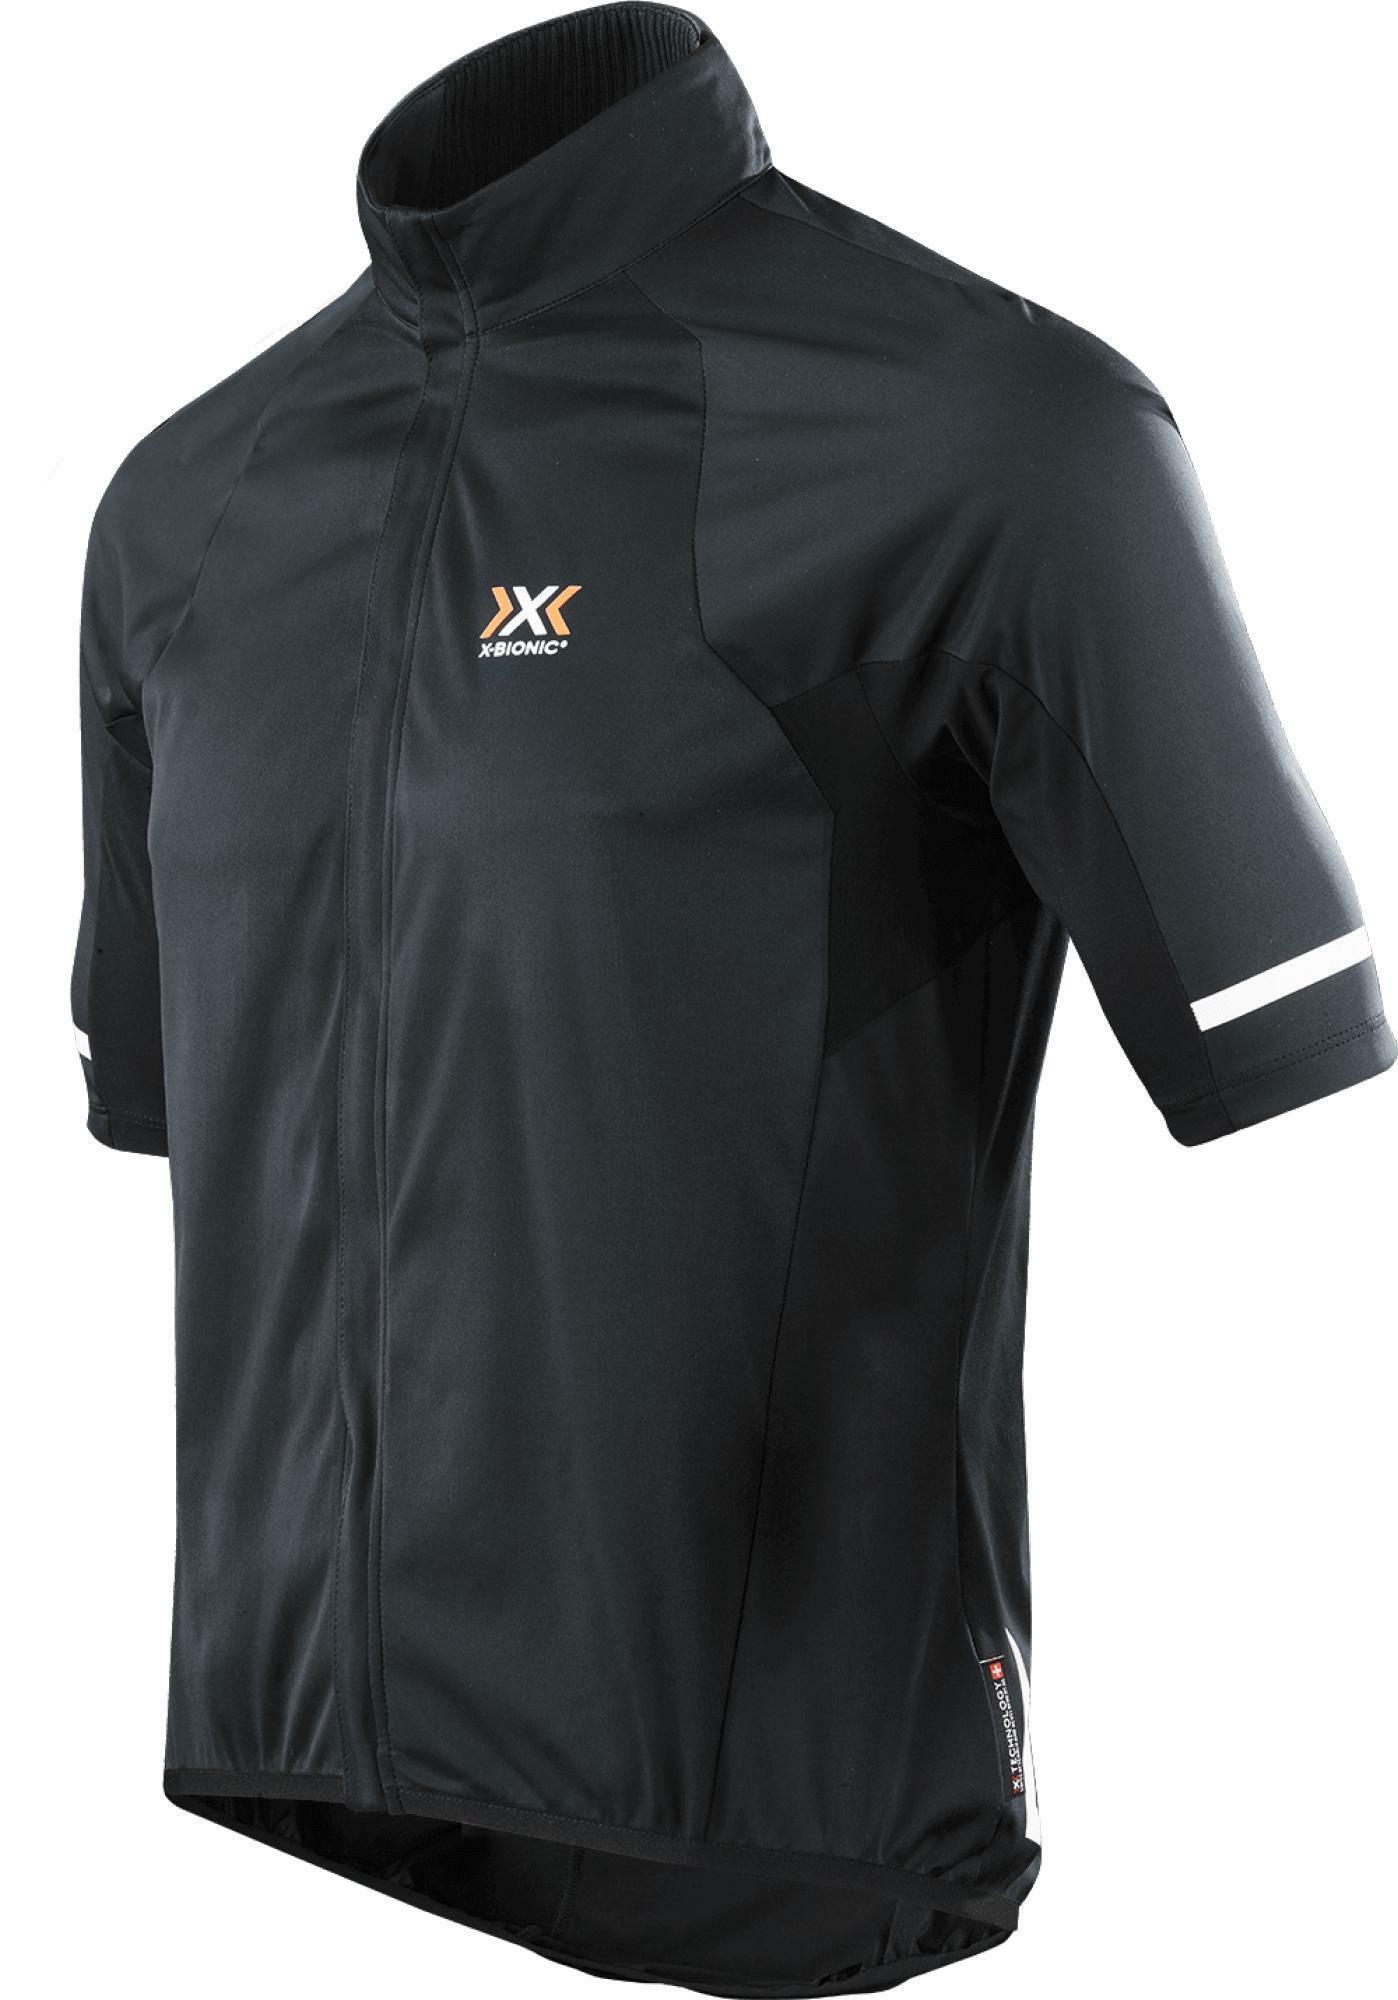 x-bionic x-bionic giacca rainsphere